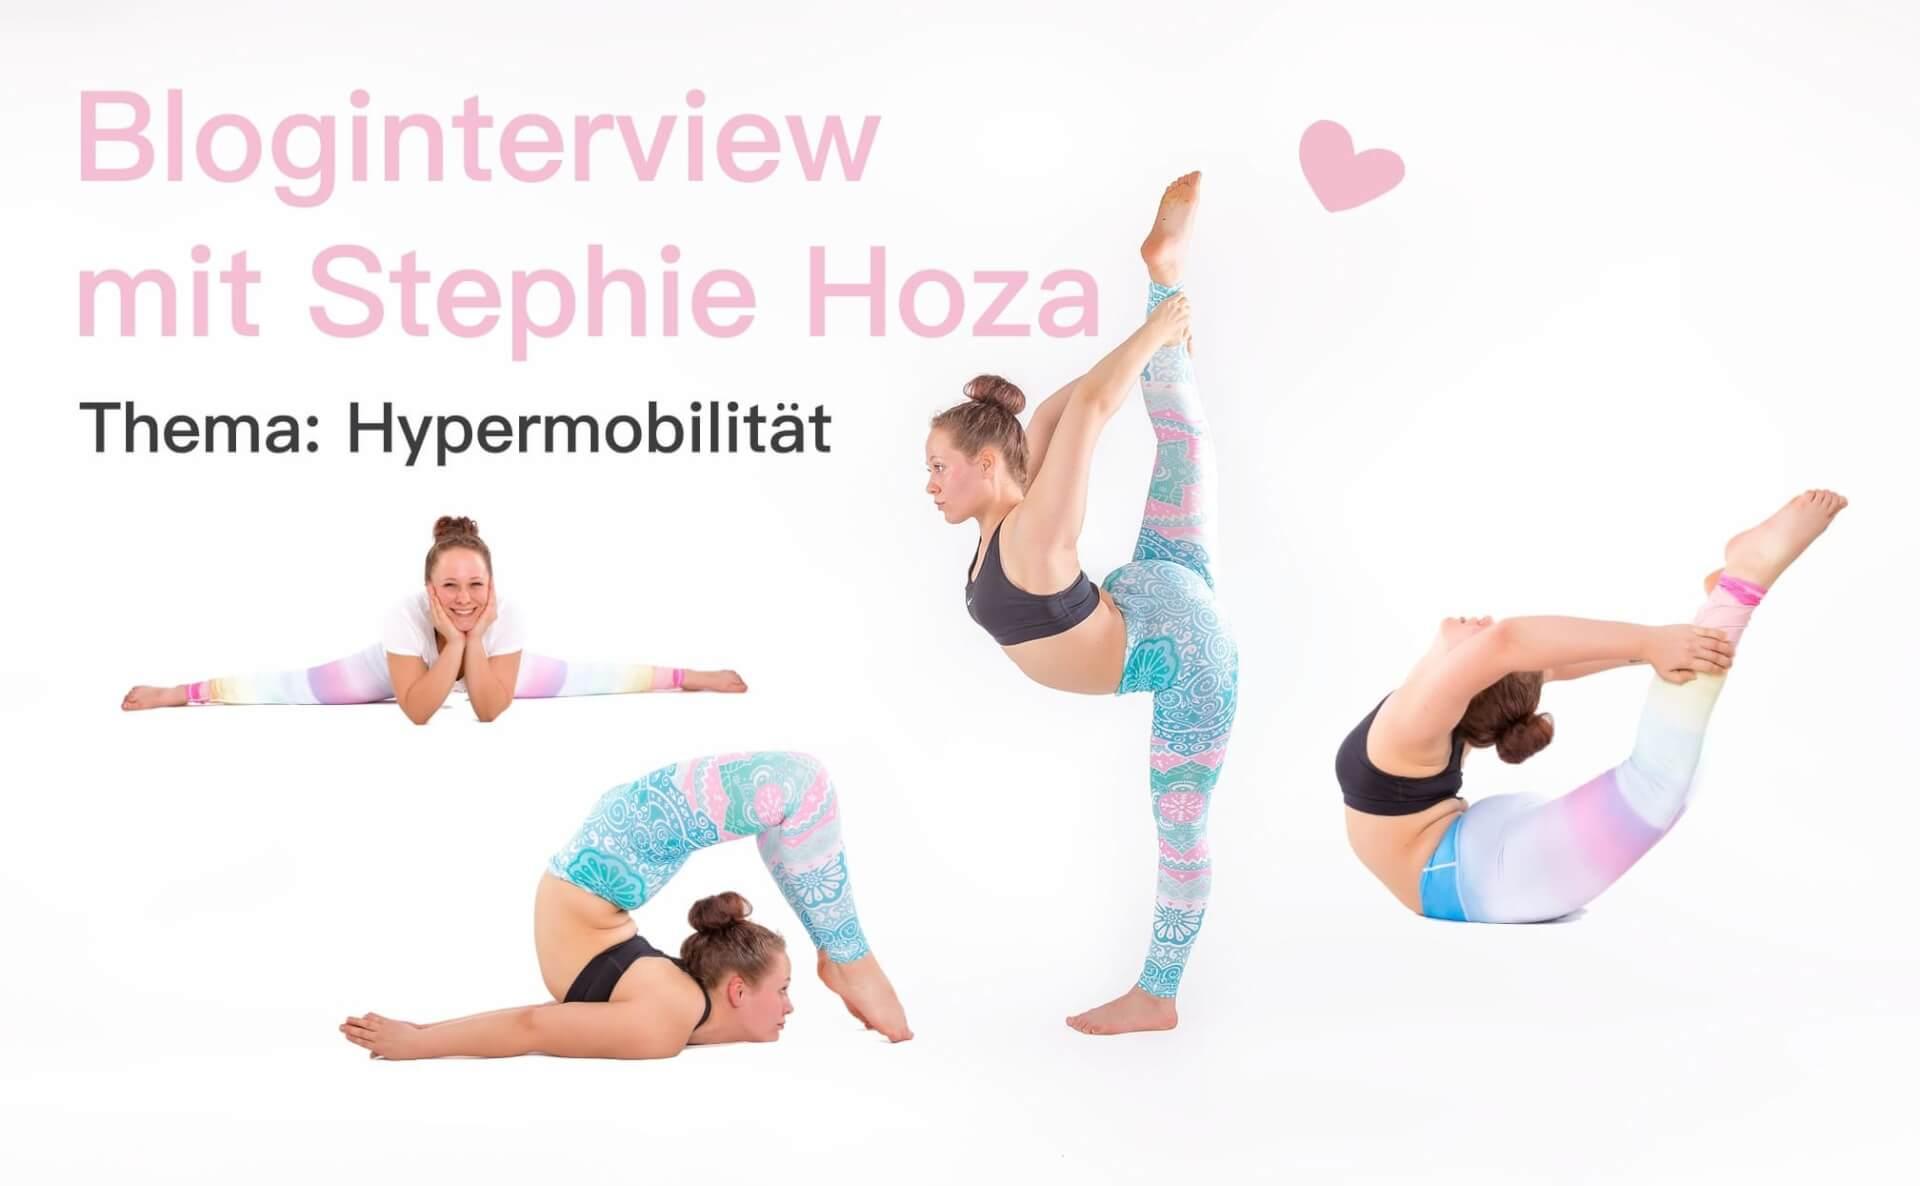 Bloginterview Stephie Hoza: Hypermobilität